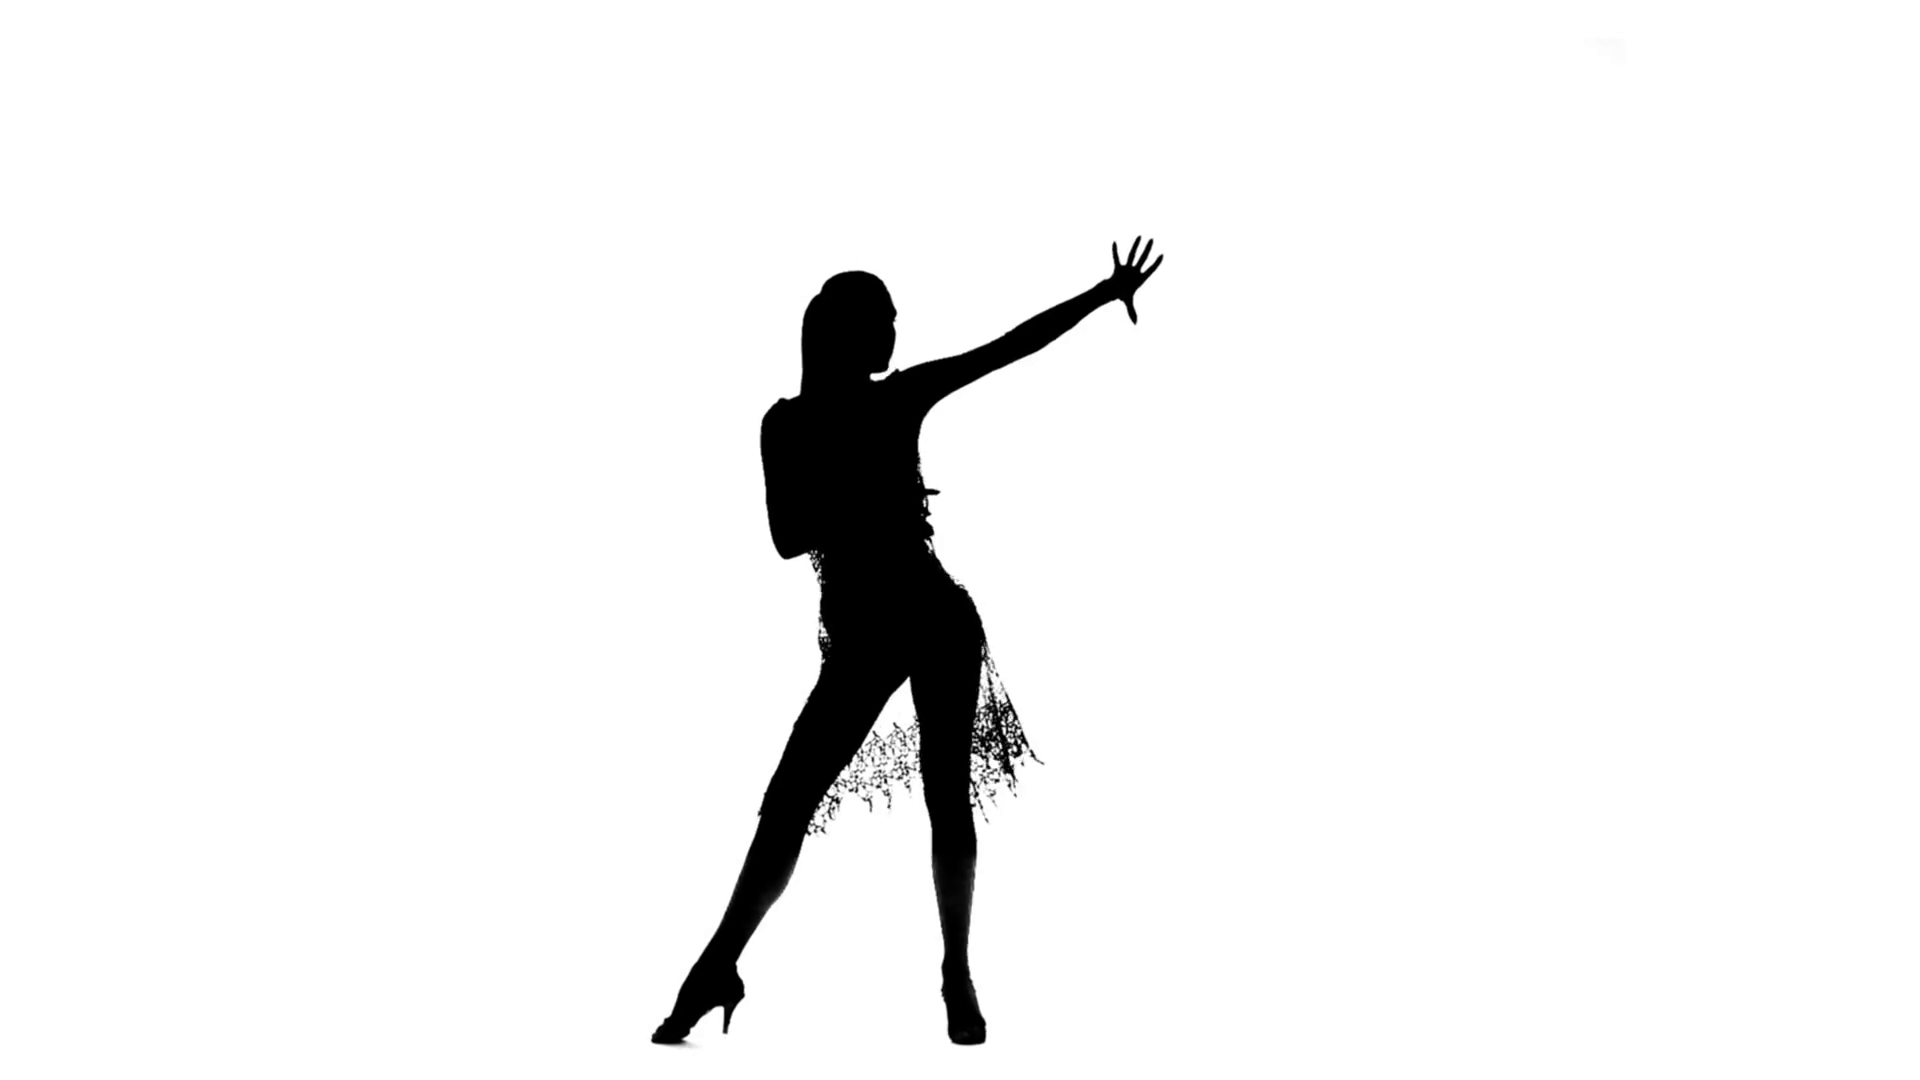 Solo girl dancing elements of ballroom dancing. Silhouette, slow motion  Stock Video Footage - VideoBlocks - Ballroom Dancing PNG HD